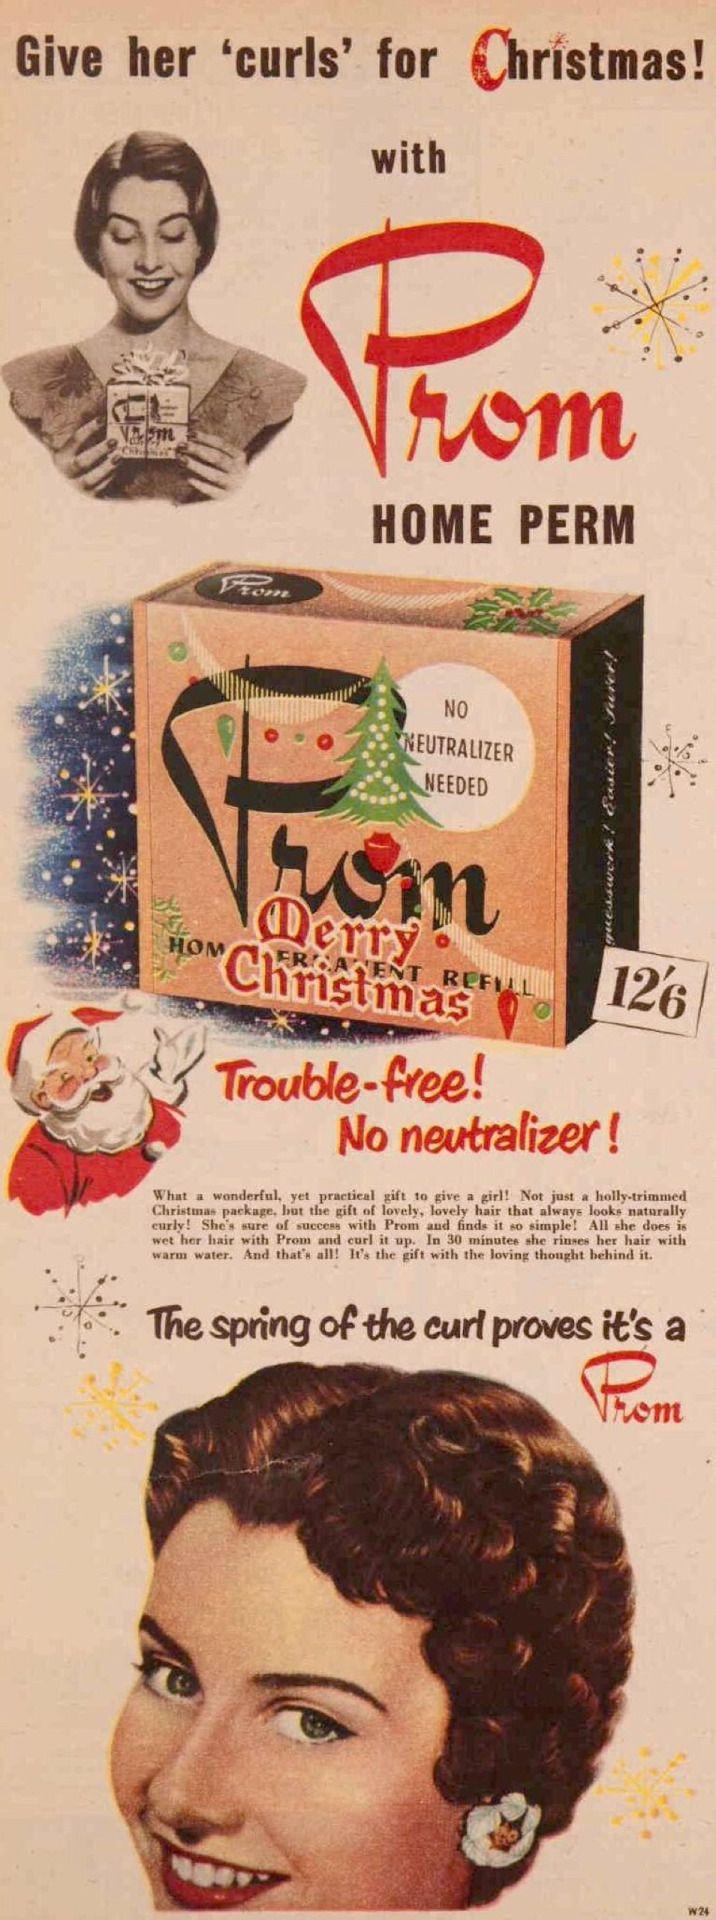 Straight perm yahoo answers - Retrophile Mid Centurylove Nothing Says Christmas Like A